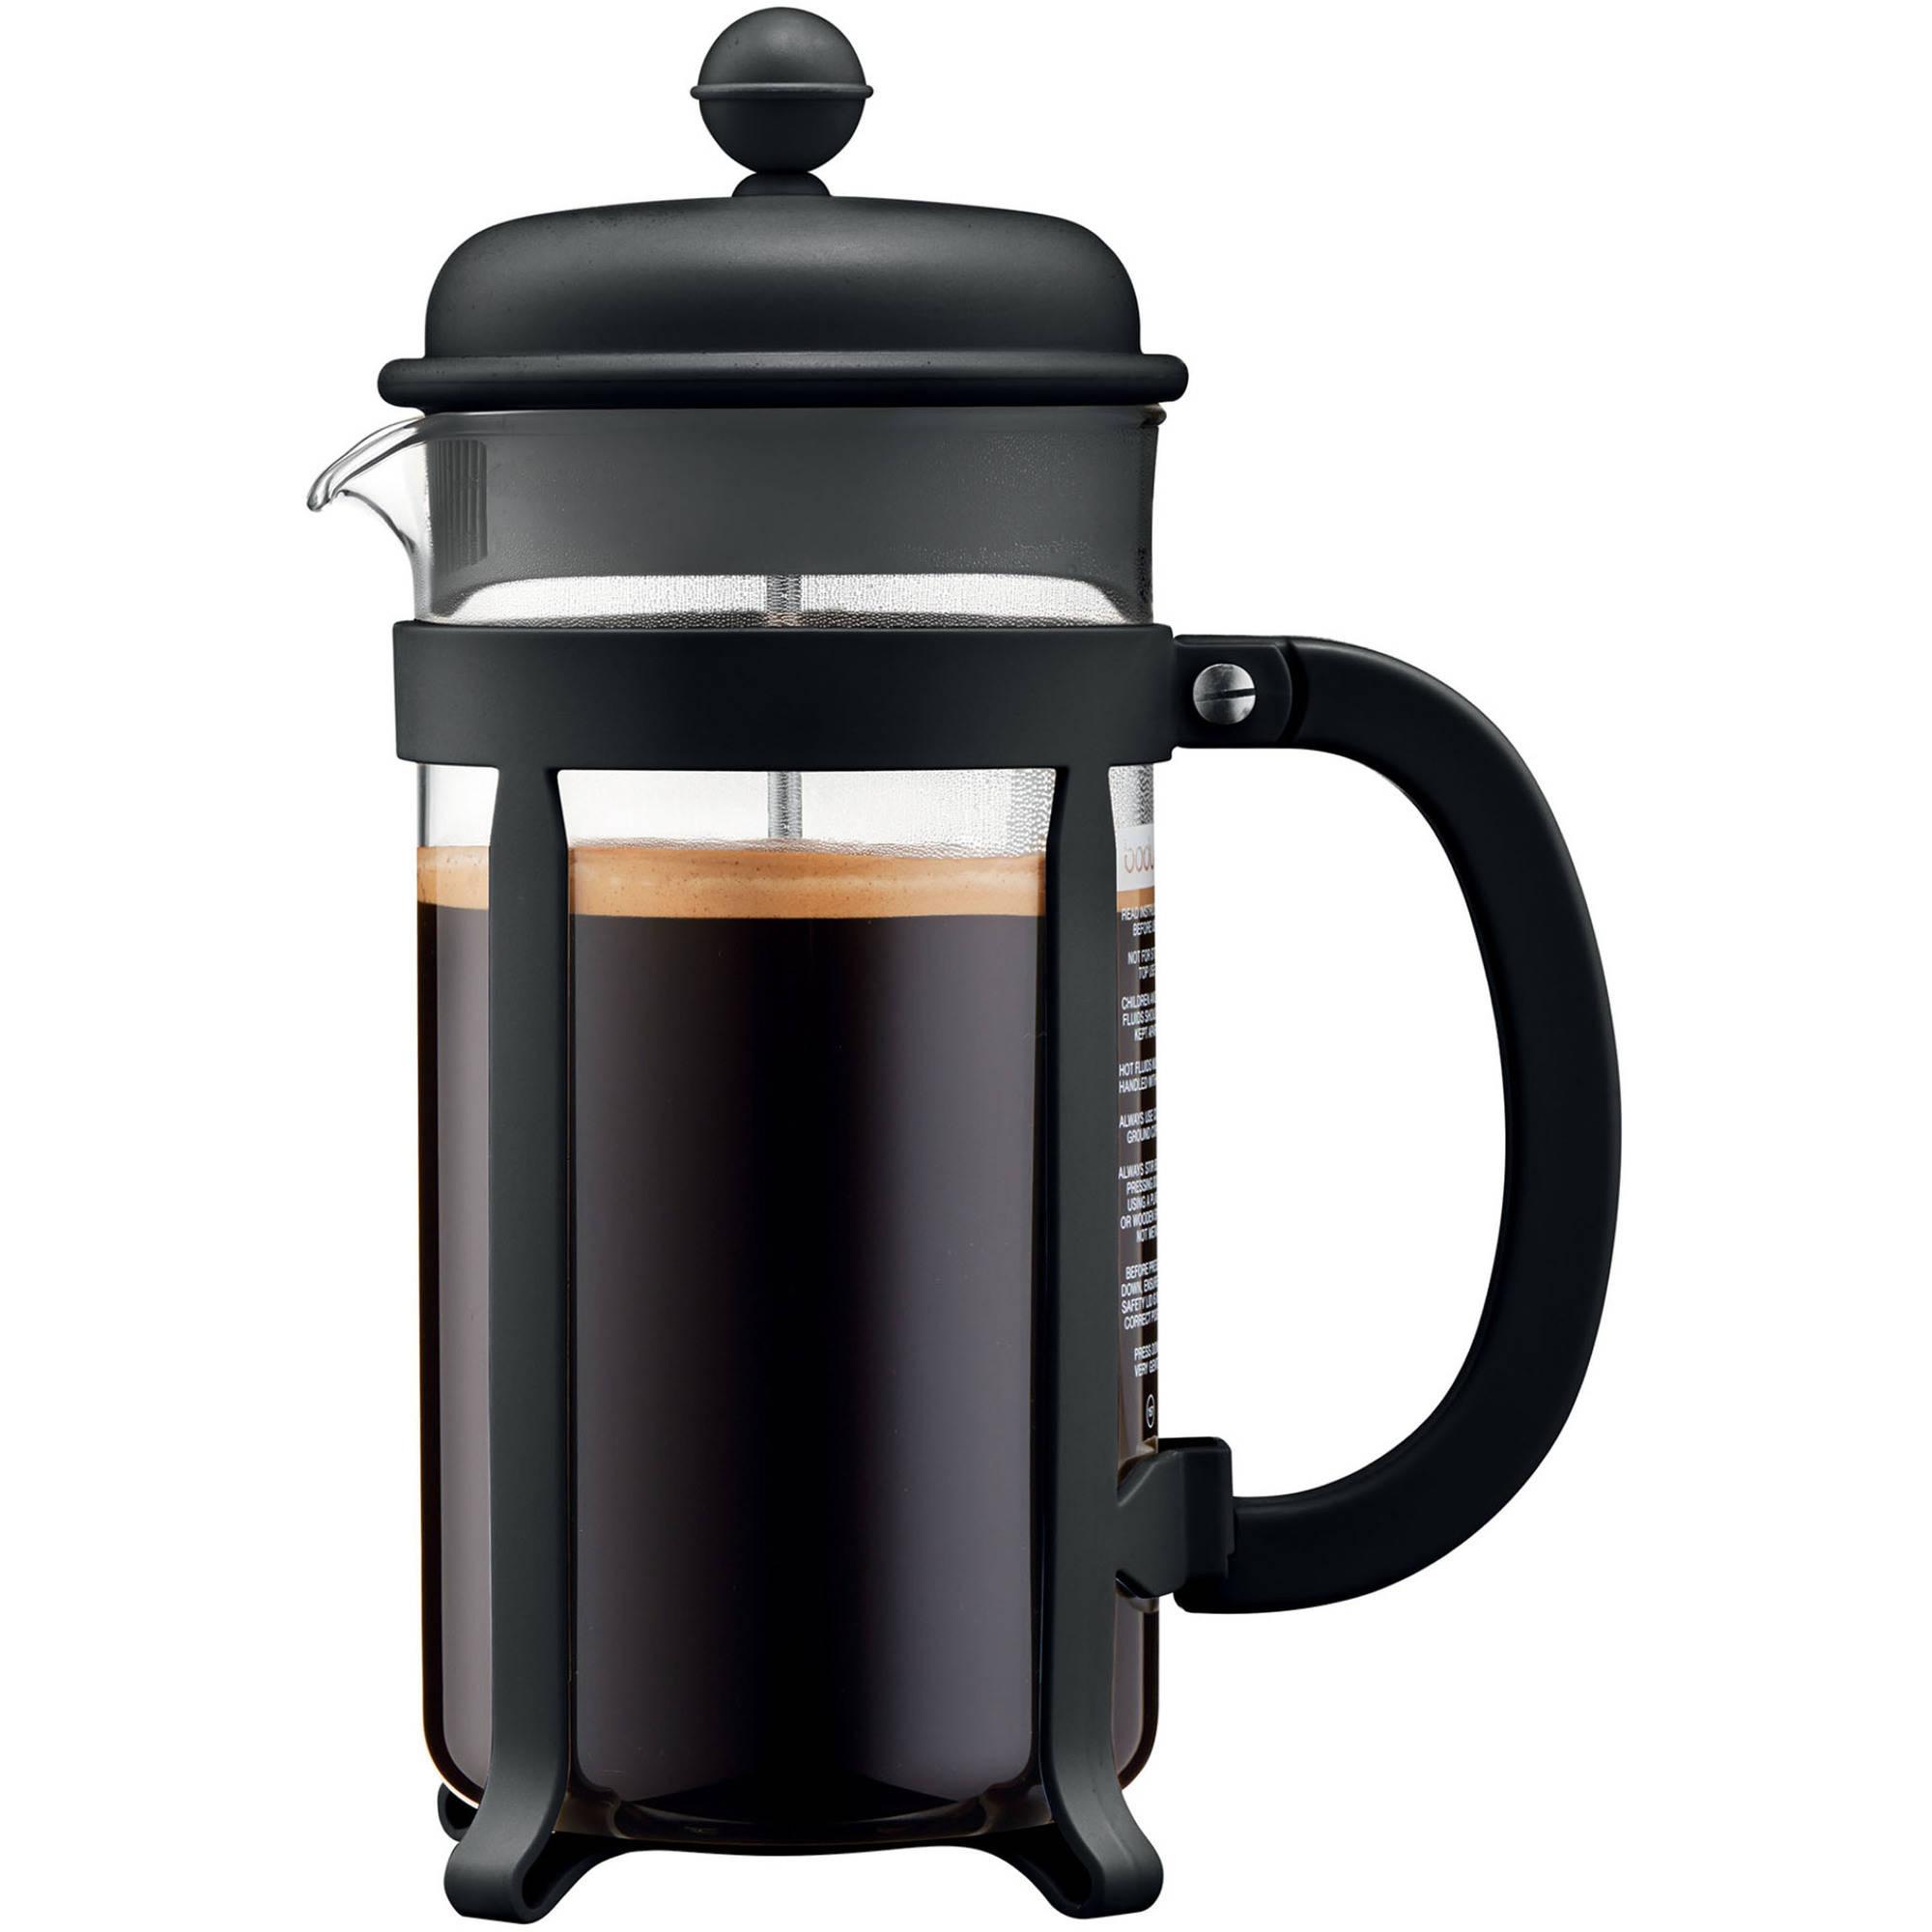 Bodum JAVA French Press Coffee Maker, 8 Cup, 1.0L, 34 oz, Black